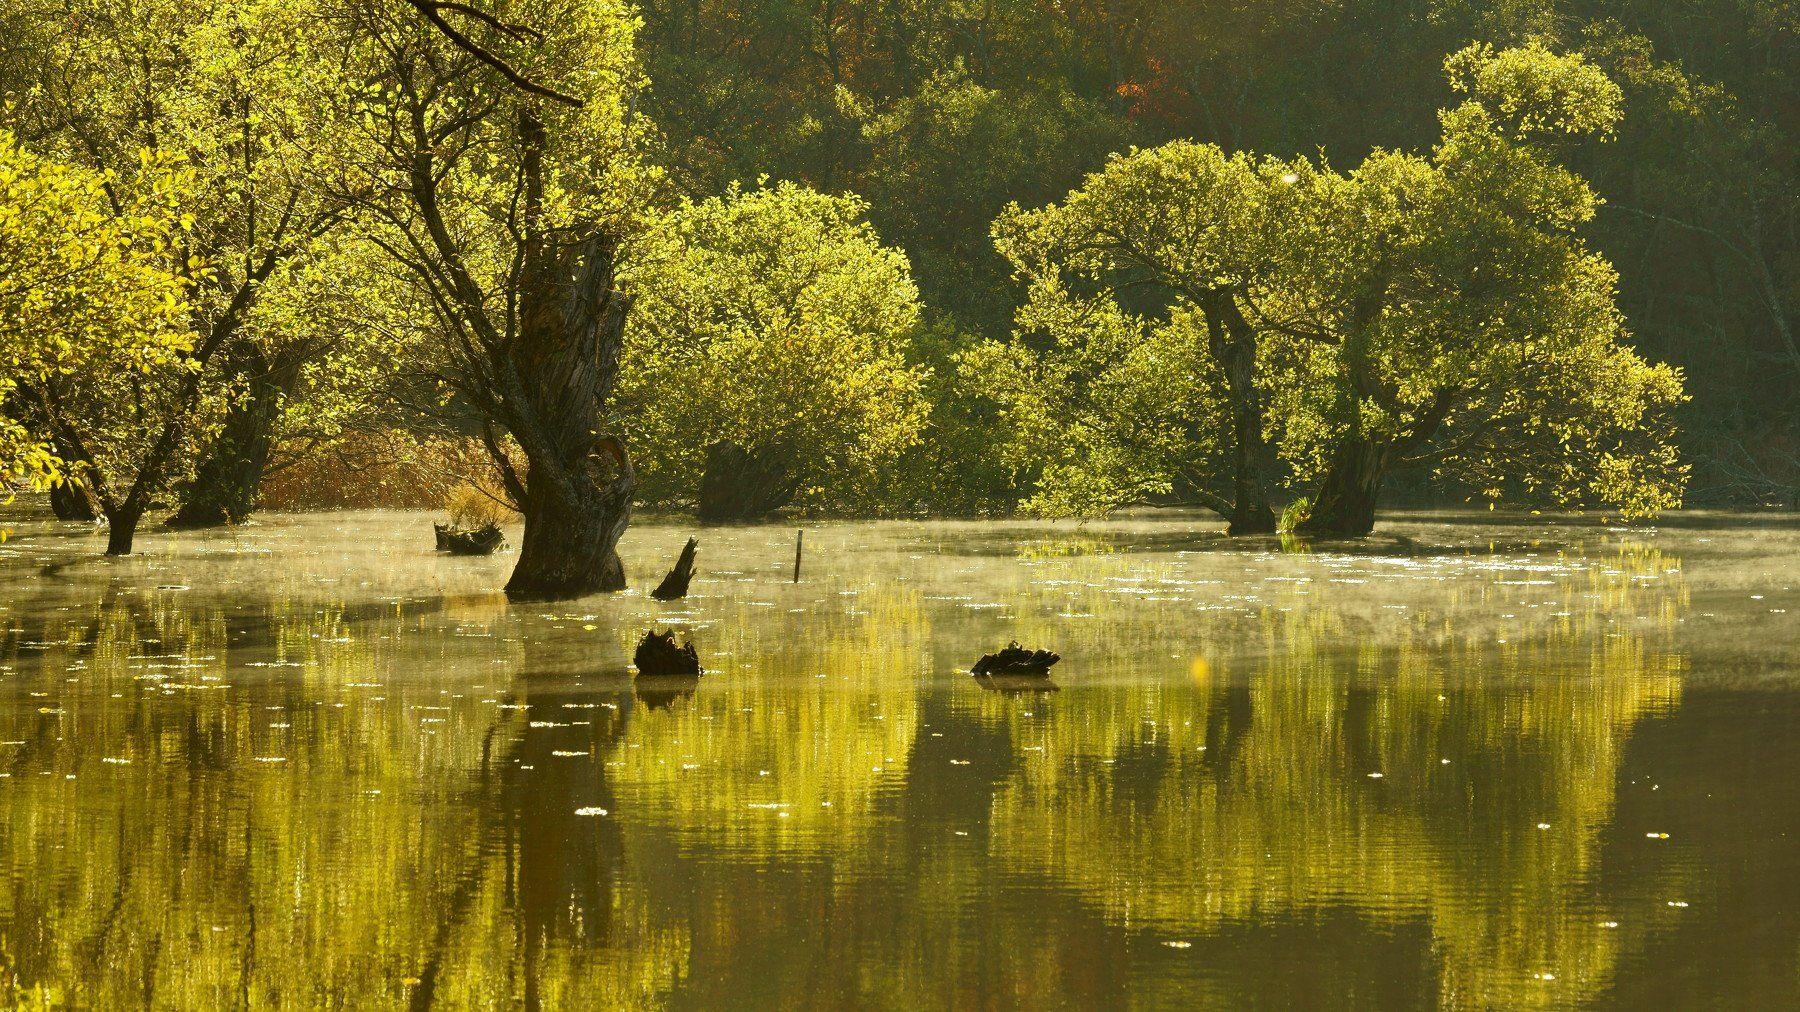 korea,autumn,reservoir,reflection,water,sunlight,backlight,morning,bud tree,, Shin